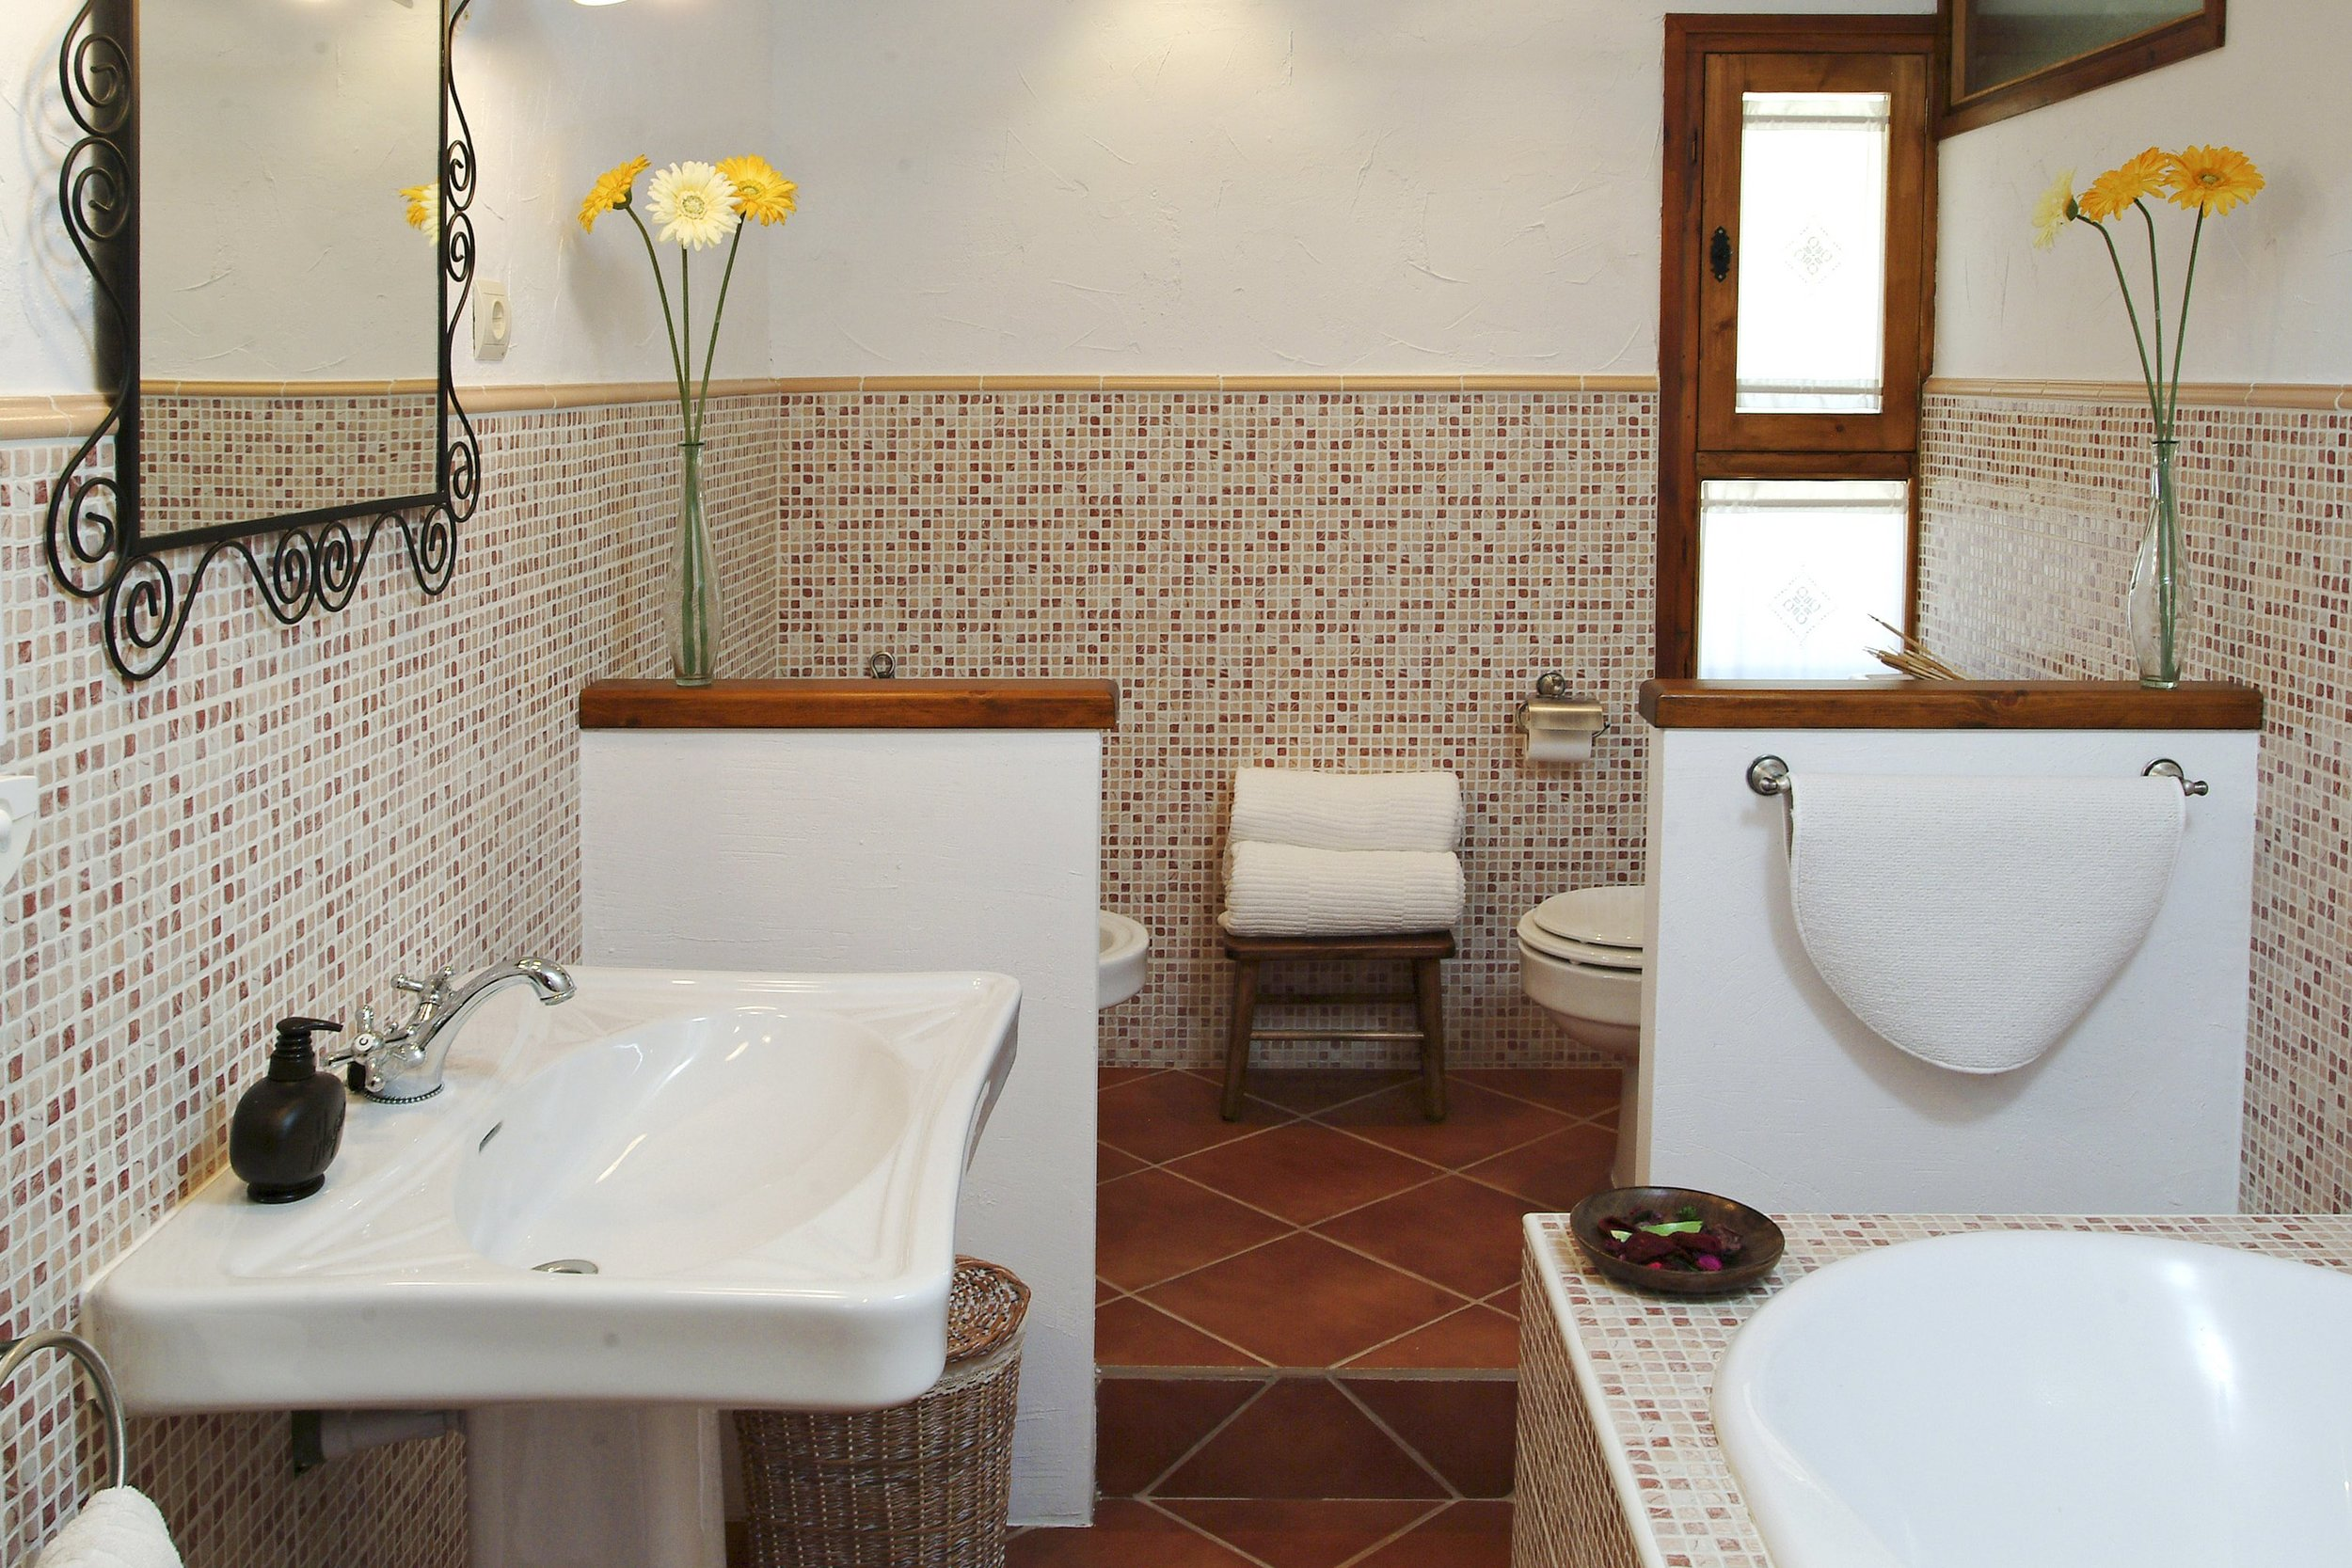 04 garbi batroom 1MB.jpg